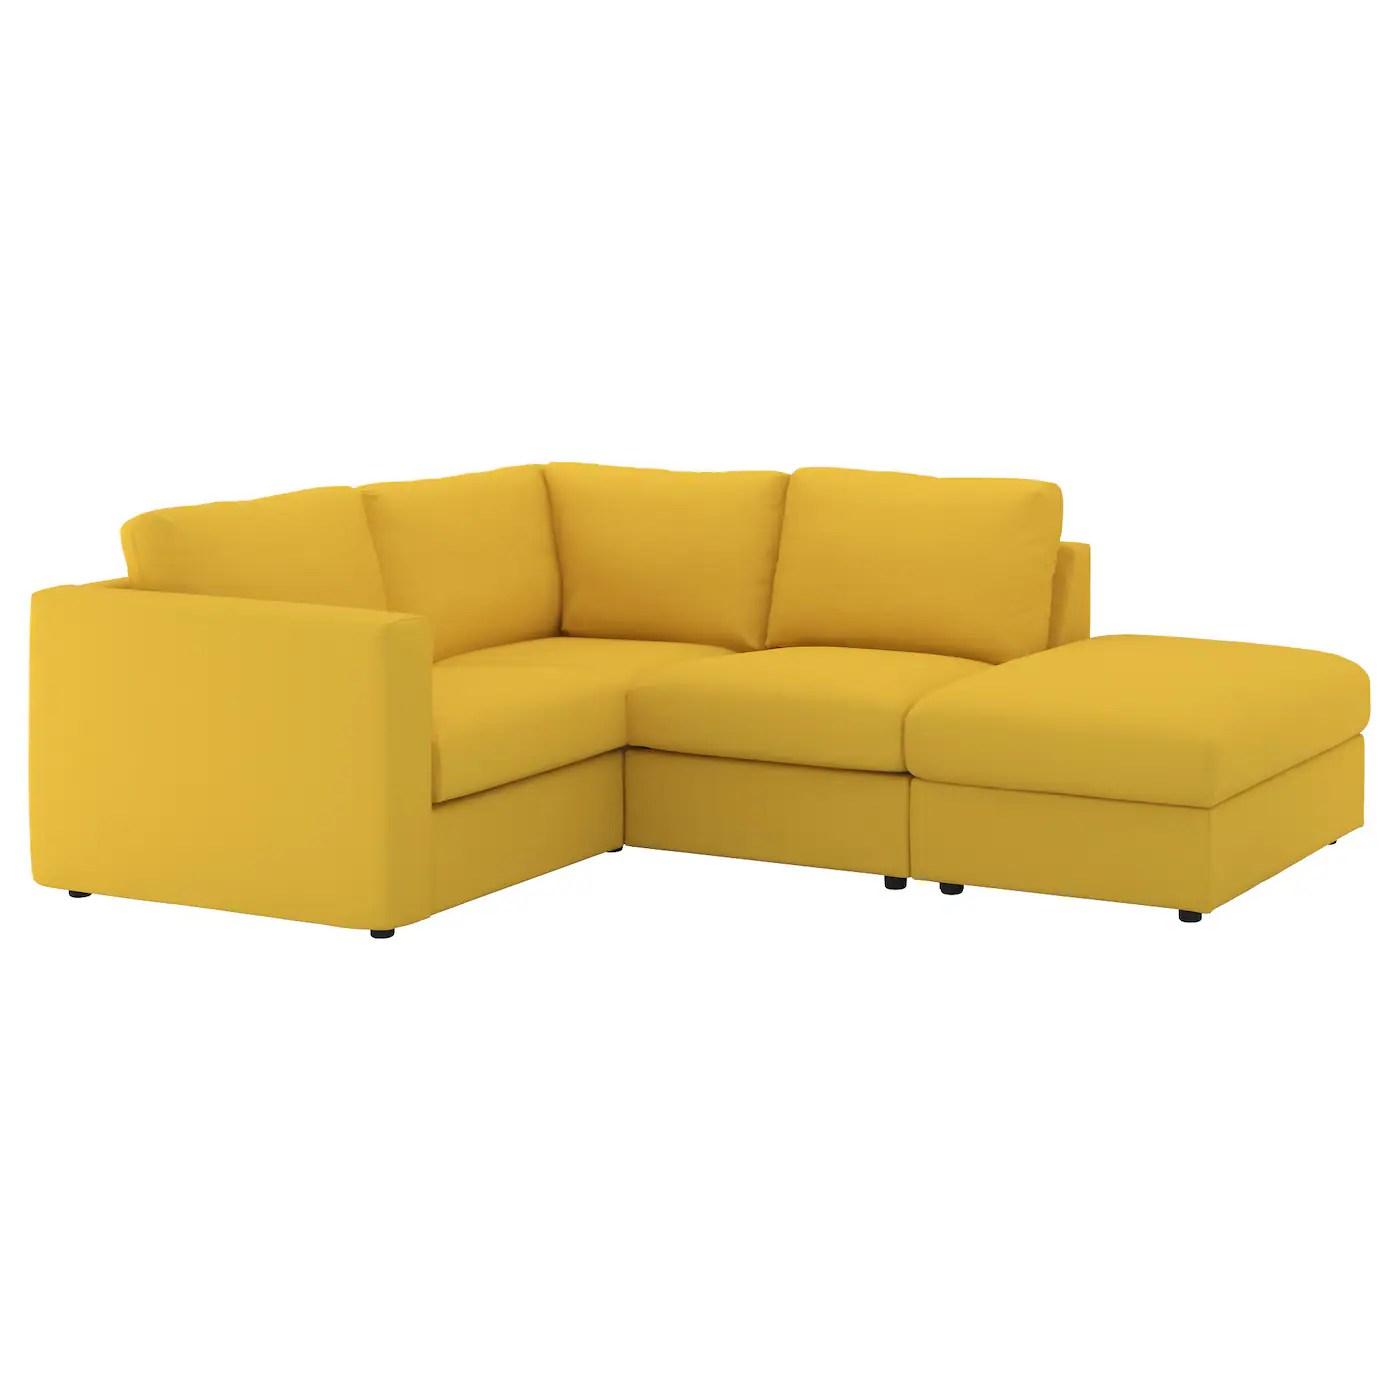 yellow sofa bed ikea backless crossword solver corner sofas